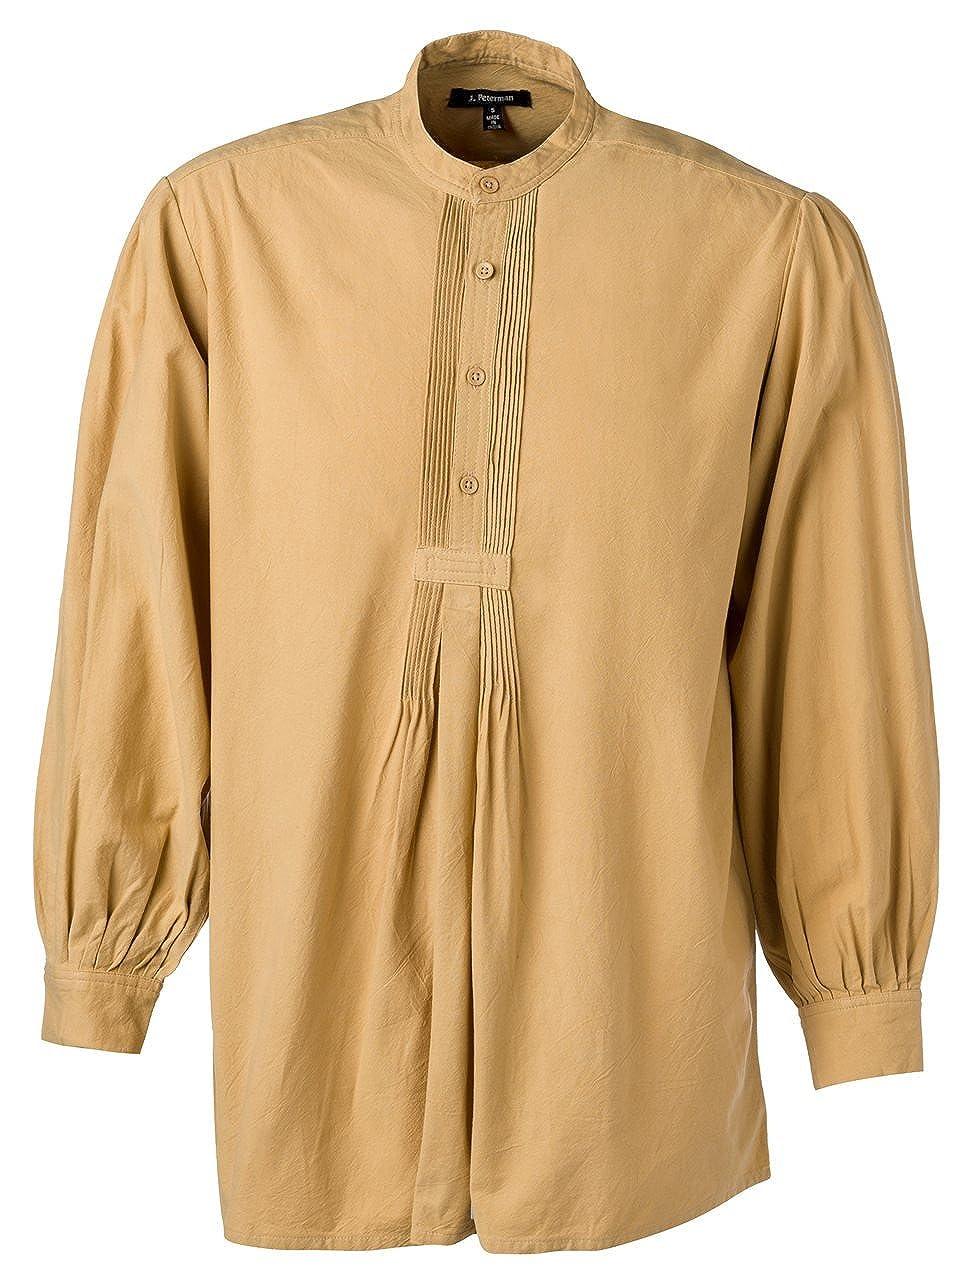 Otavalo Mountain Shirt $33.35 AT vintagedancer.com